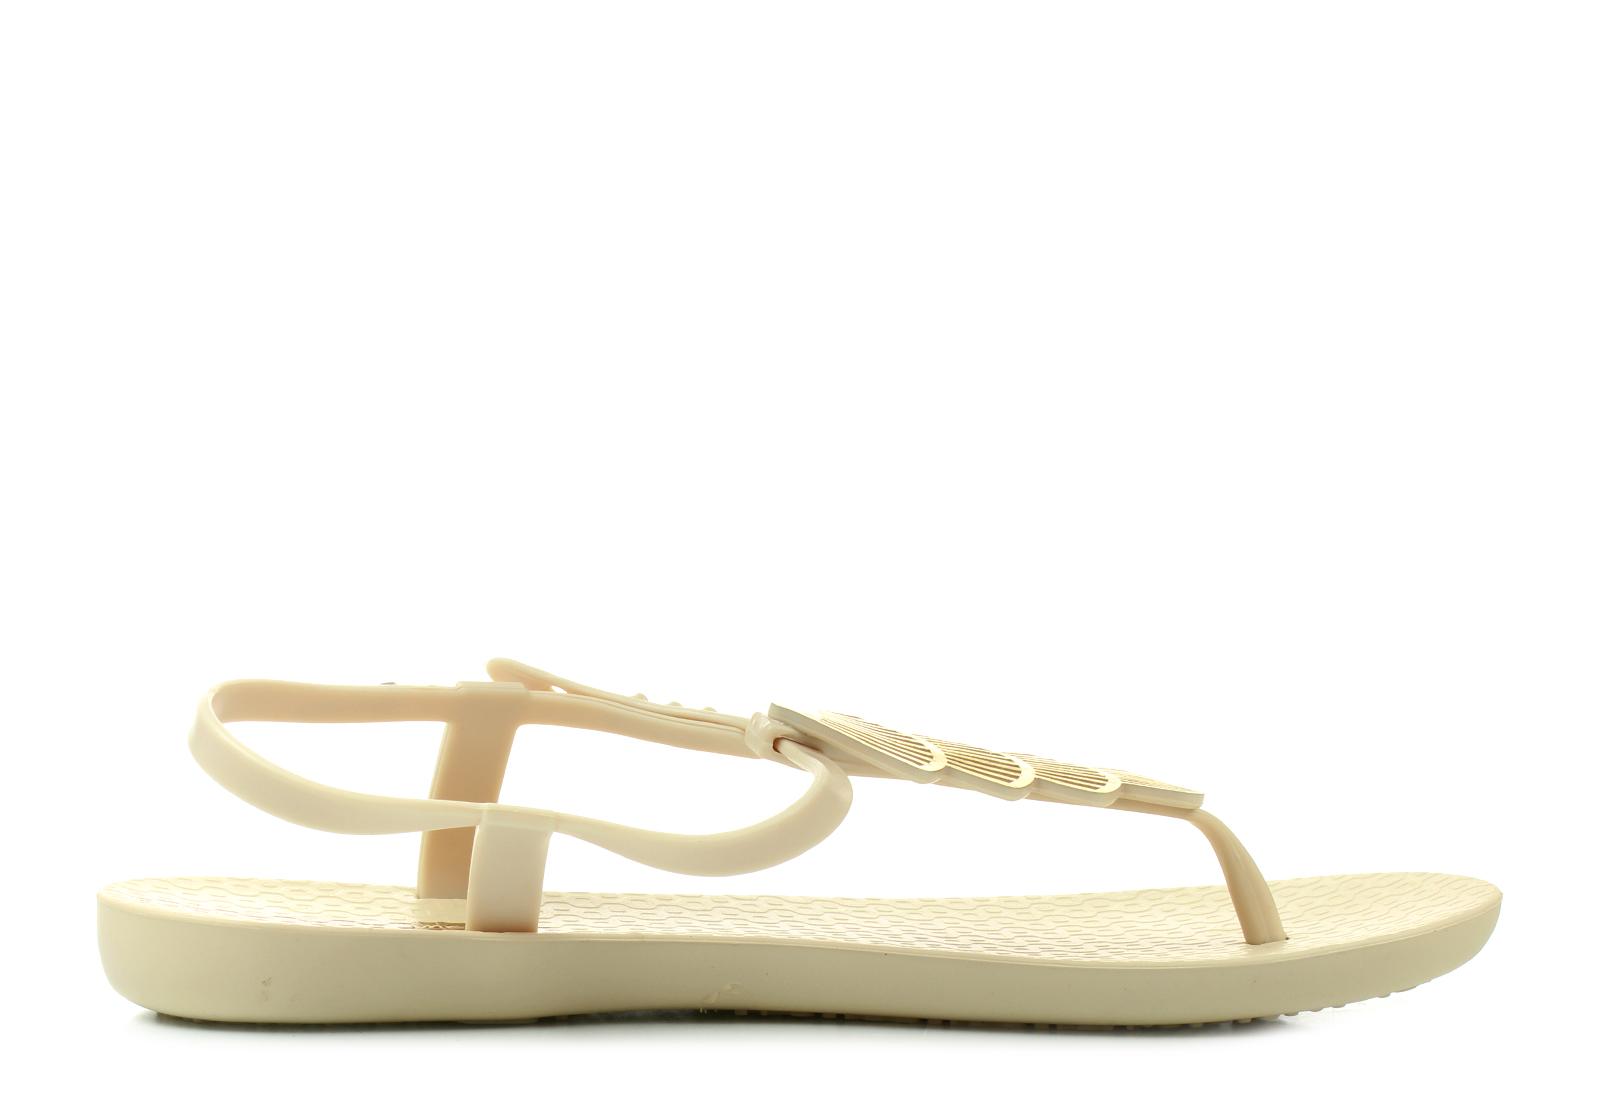 60a2a2a172 Ipanema Szandál - Class Glam Ii - 26207-20354 - Office Shoes ...